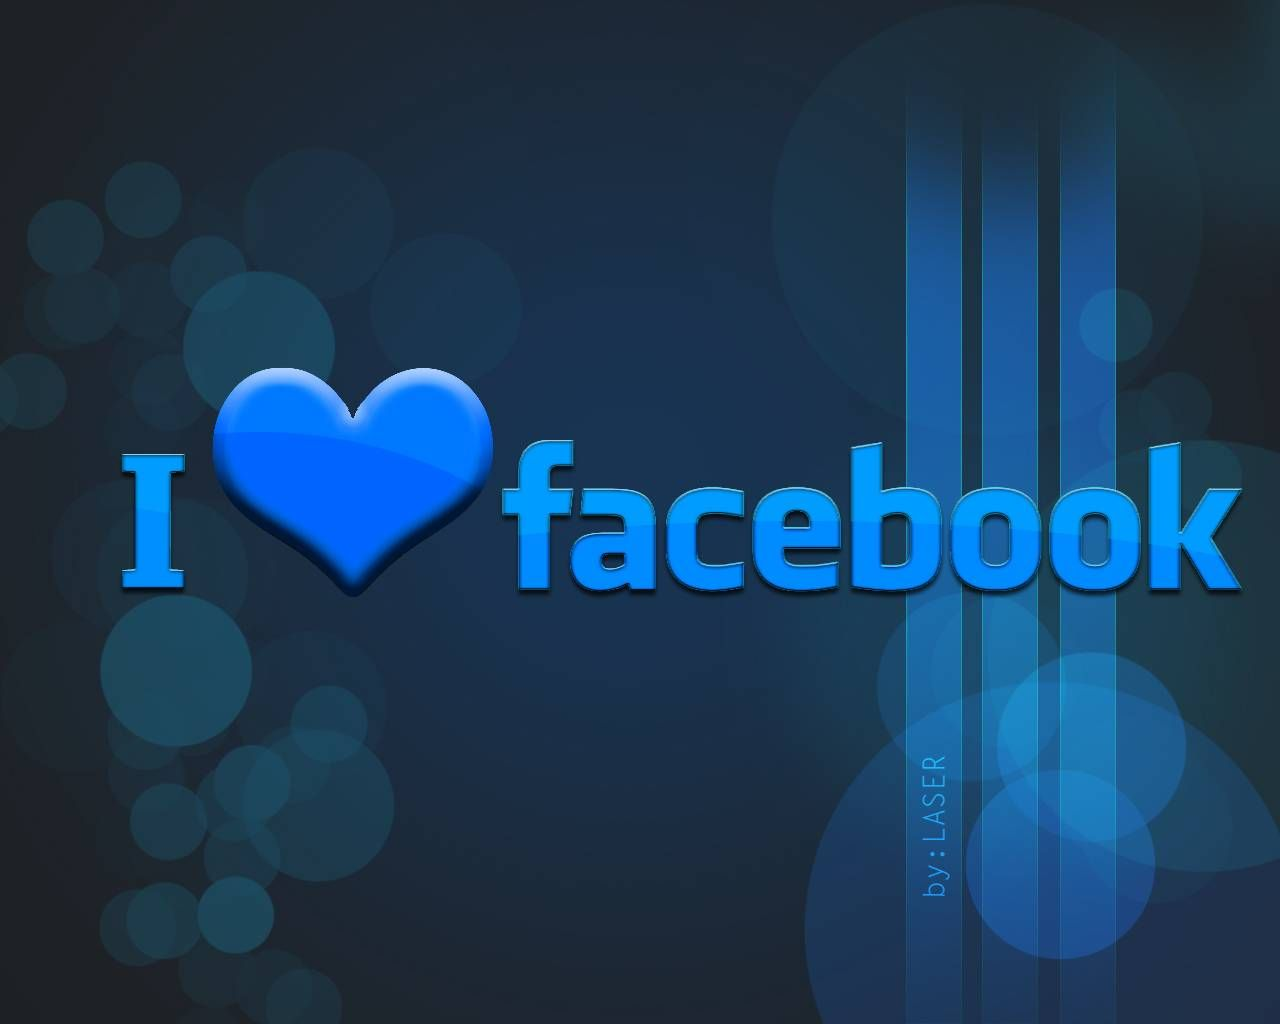 Wallpapaer For Facebookcom Love Facebook Wallpaper